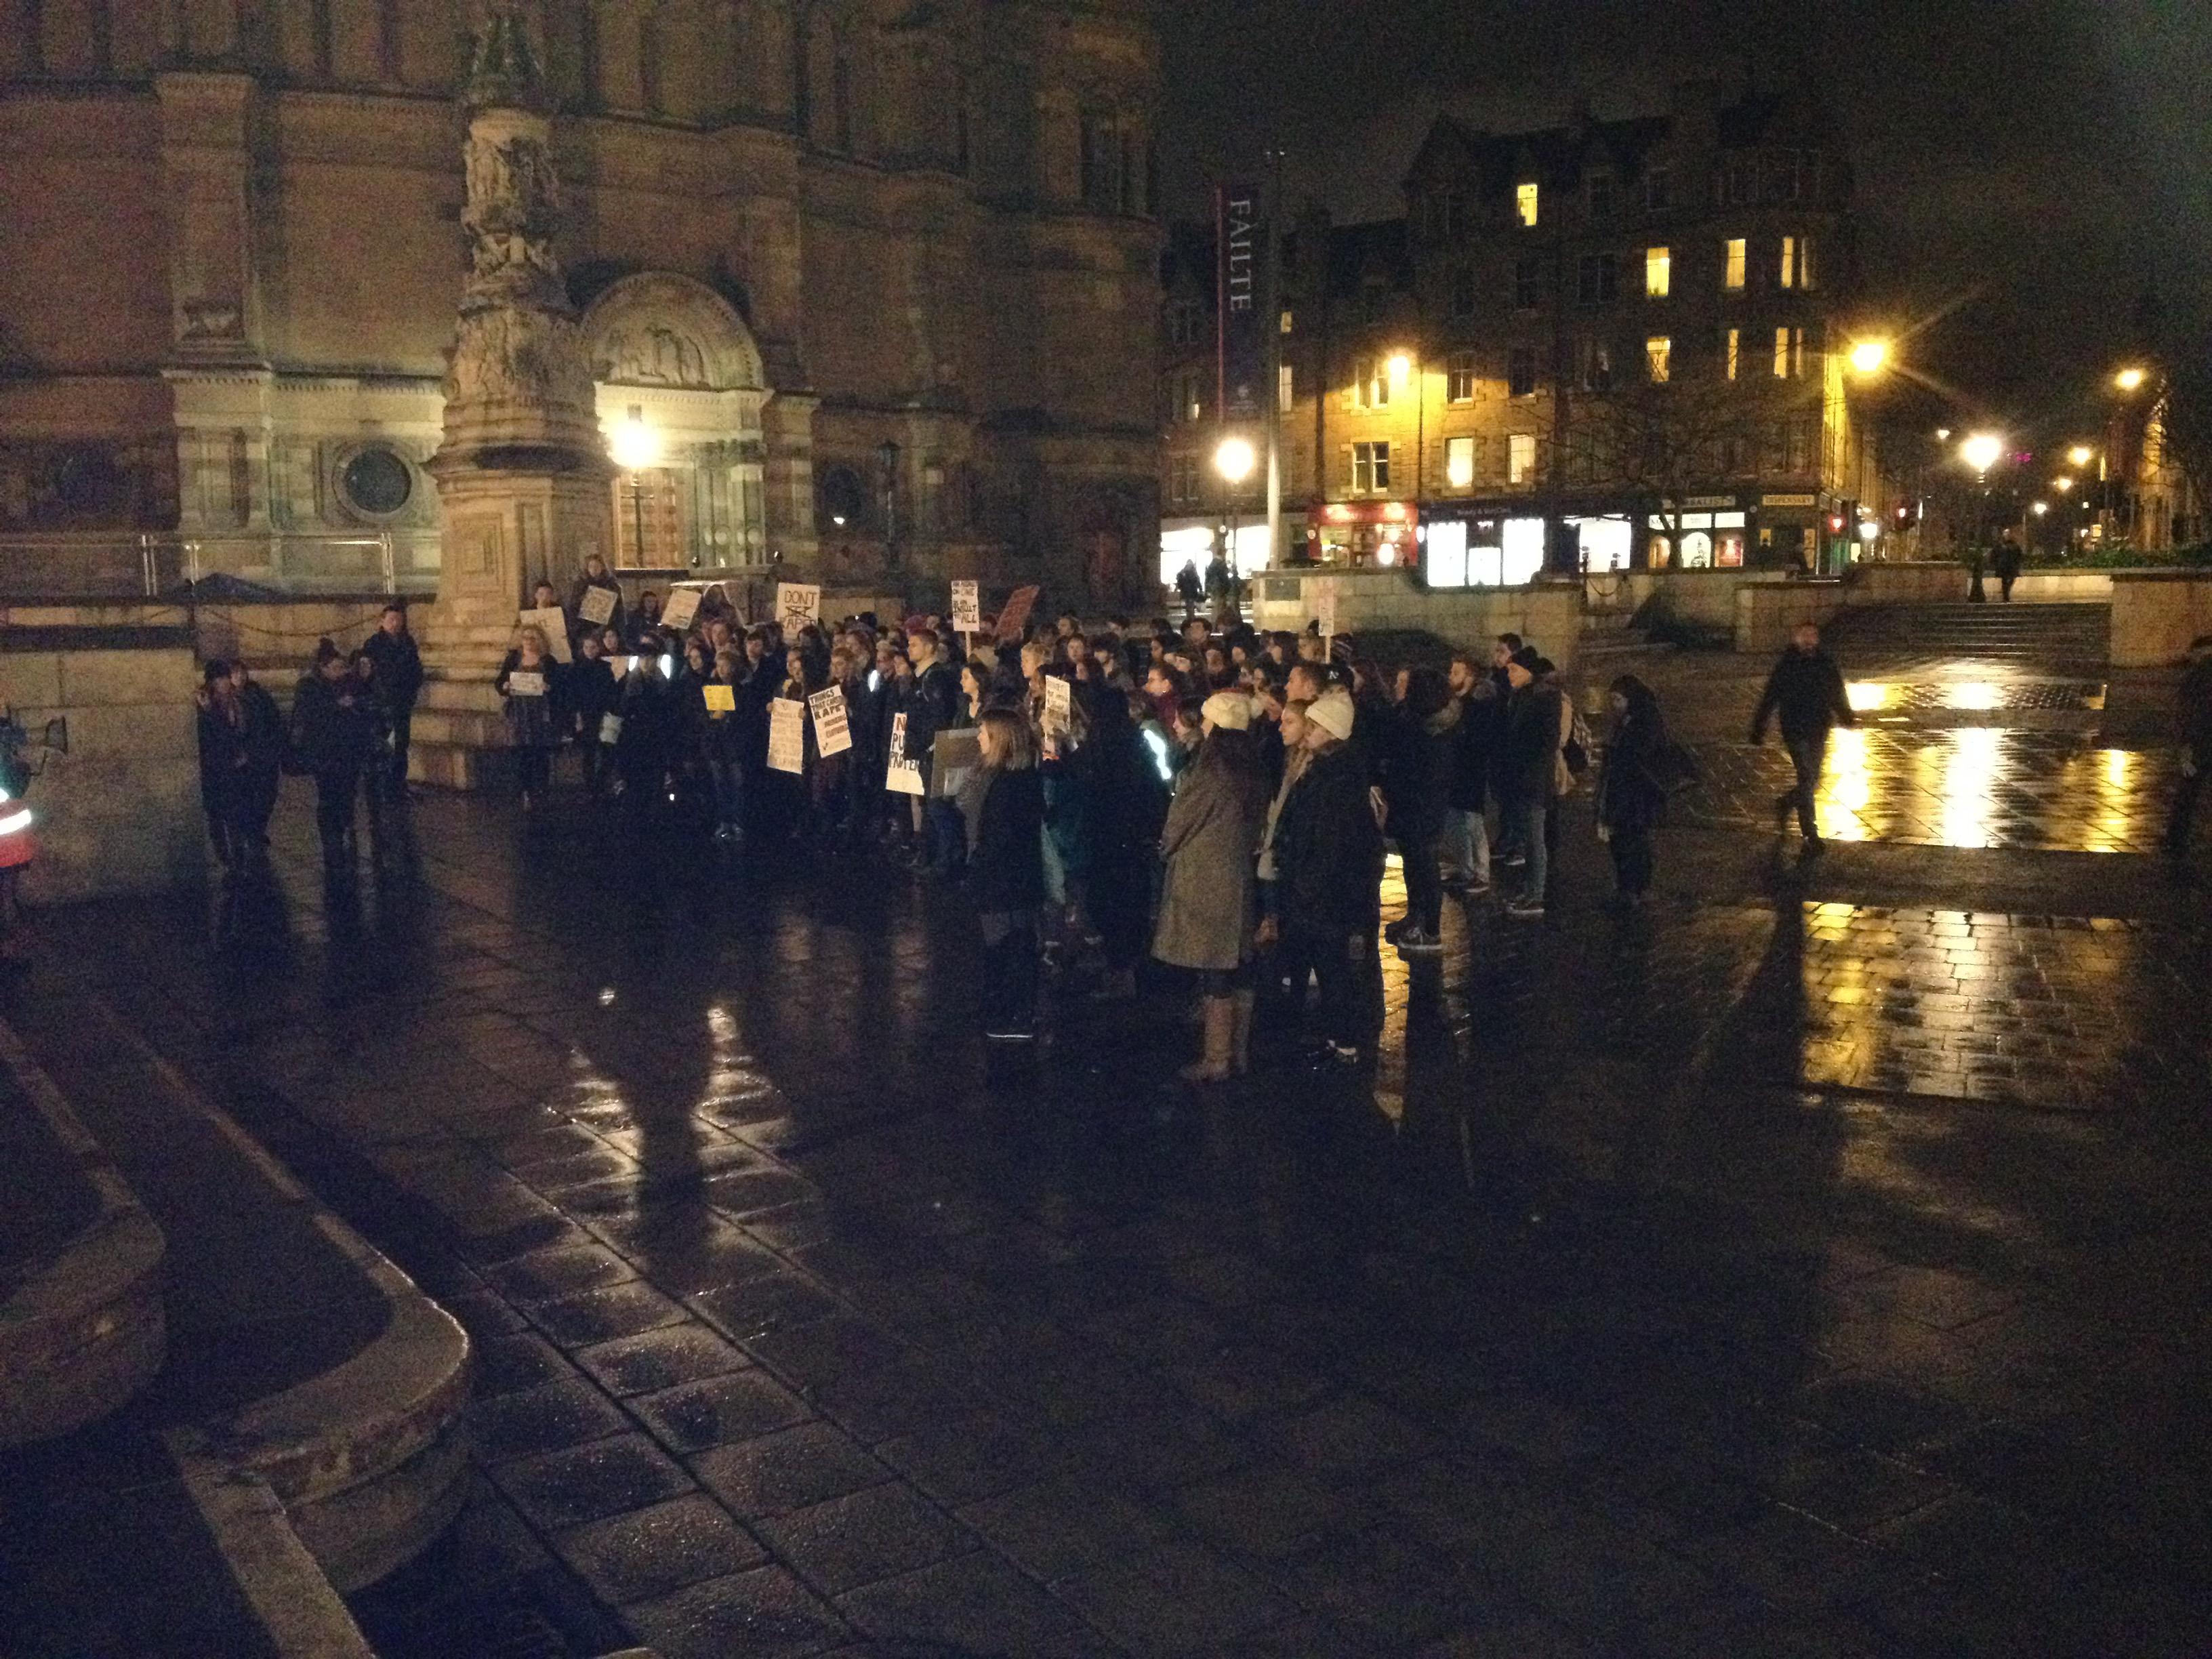 A rainy Edinburgh night